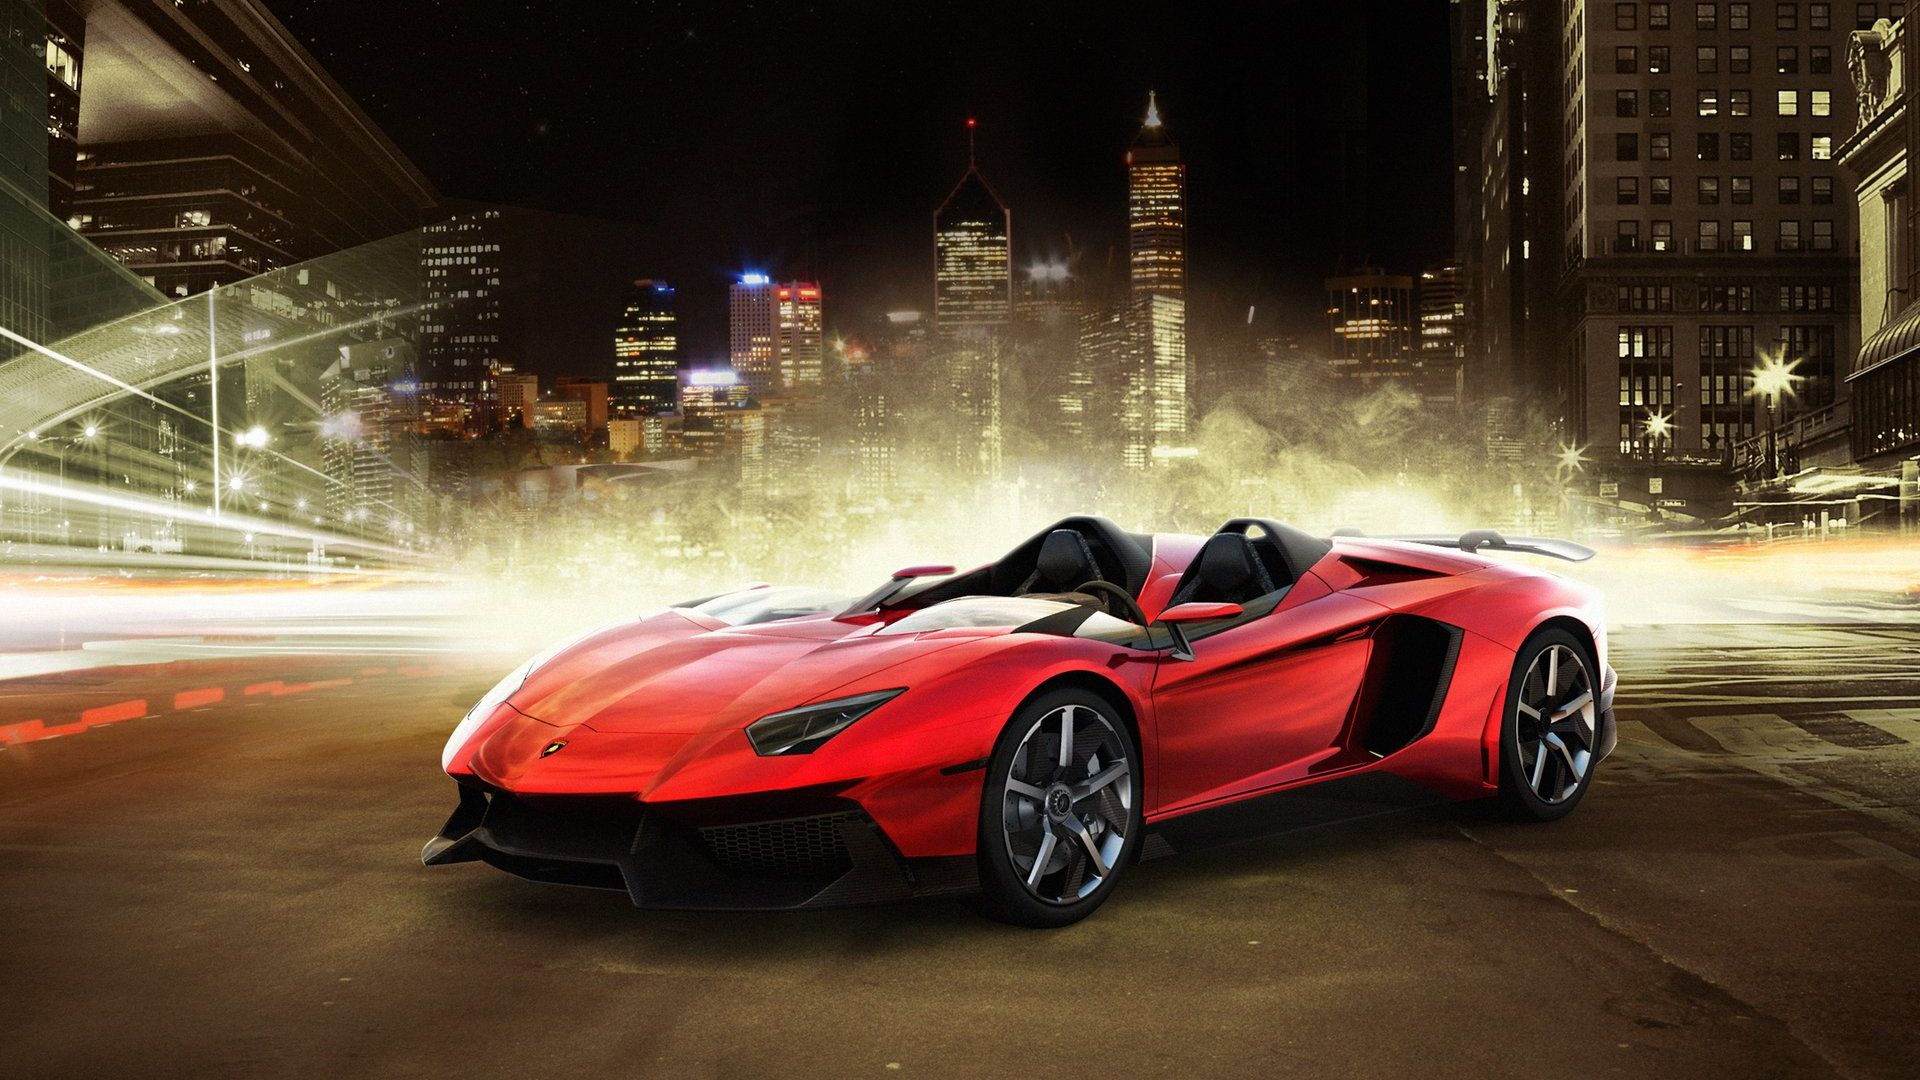 Lamborghini Aventador J HD Wallpaper | 999HDWallpaper